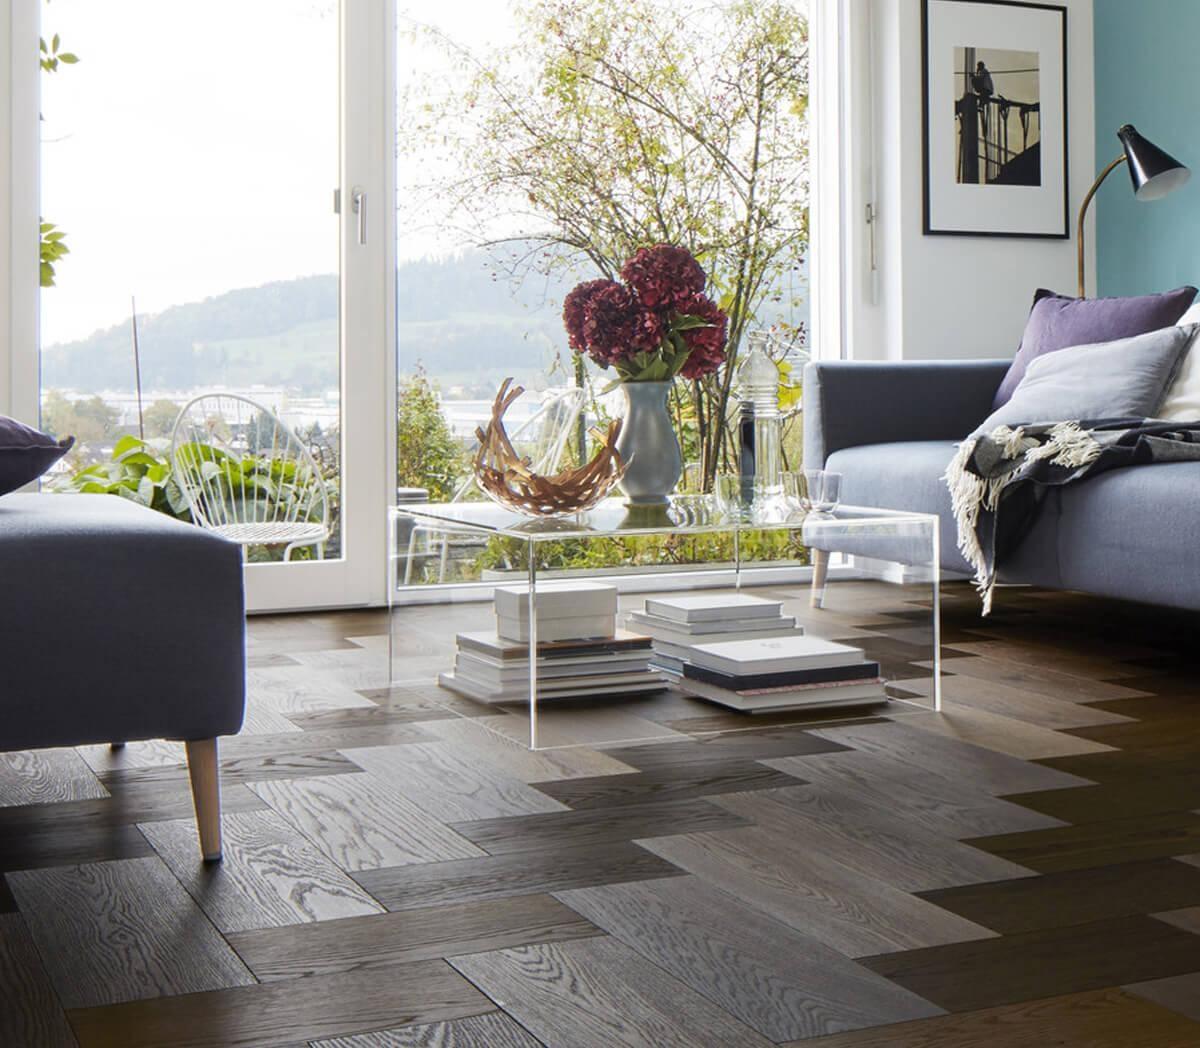 Ferrer floors ag - Parkett in Basel Reinach Bodenbeläge Linoleum PVC ...